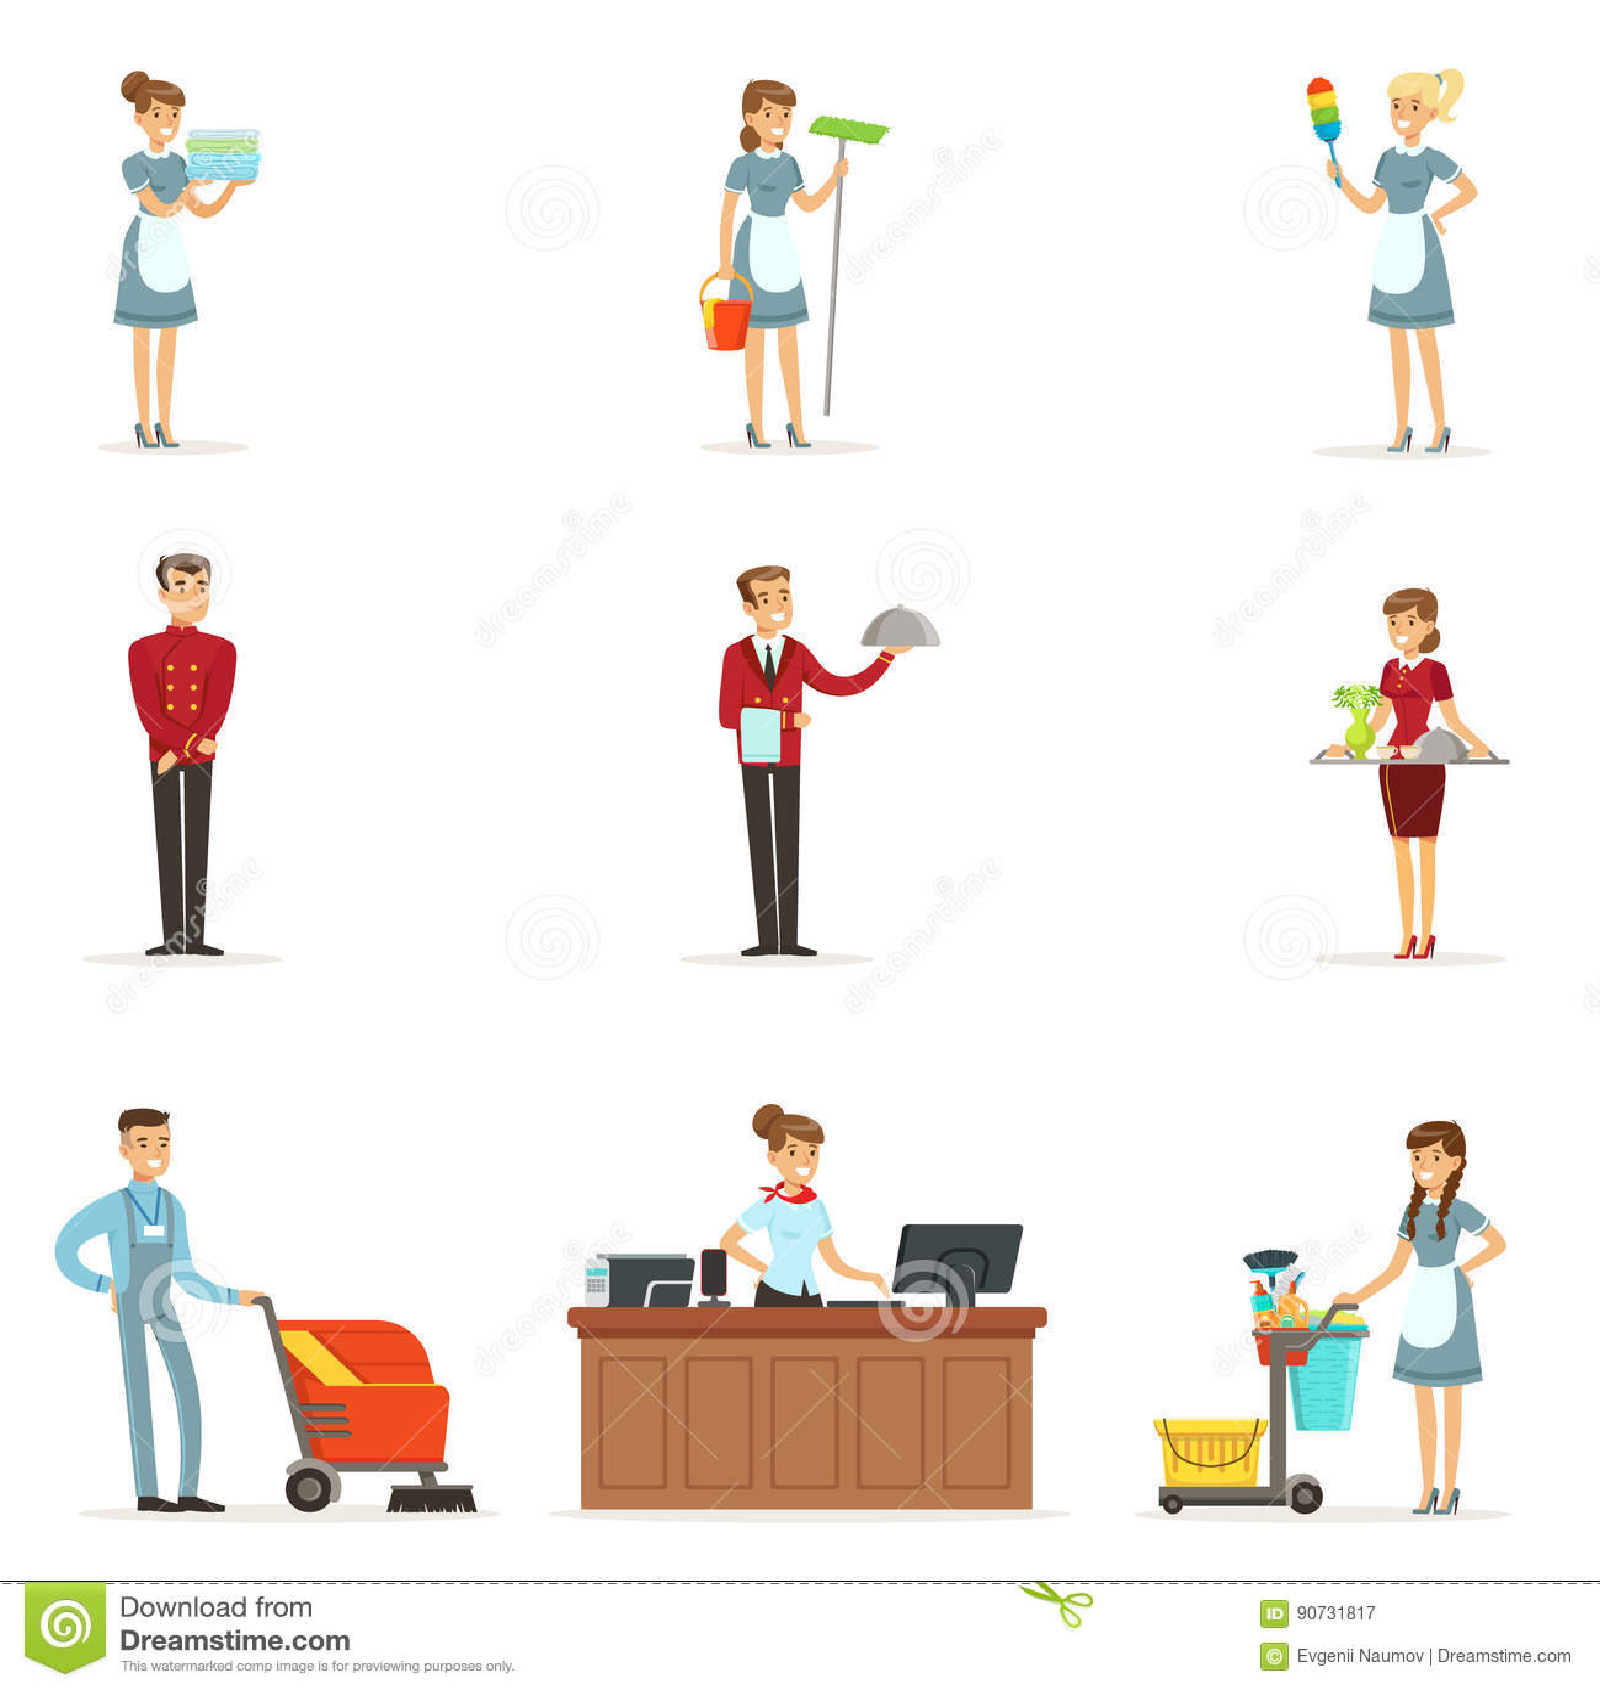 Restaurant Kitchen Manager Job Description: Set Of Man Restaurant Staff Vector Illustration